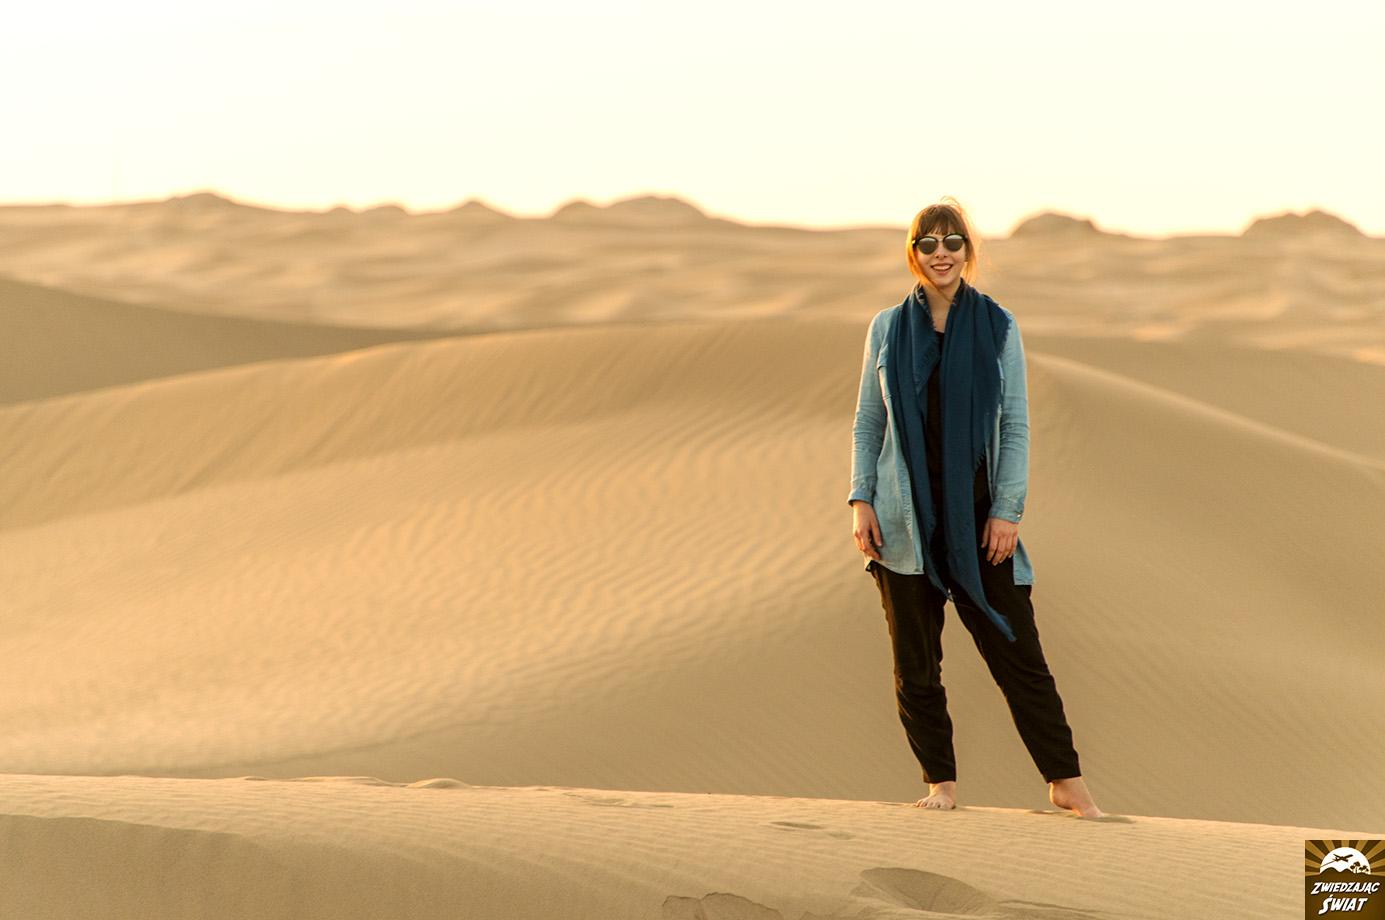 pustynia w okolicy Jazd, Iran